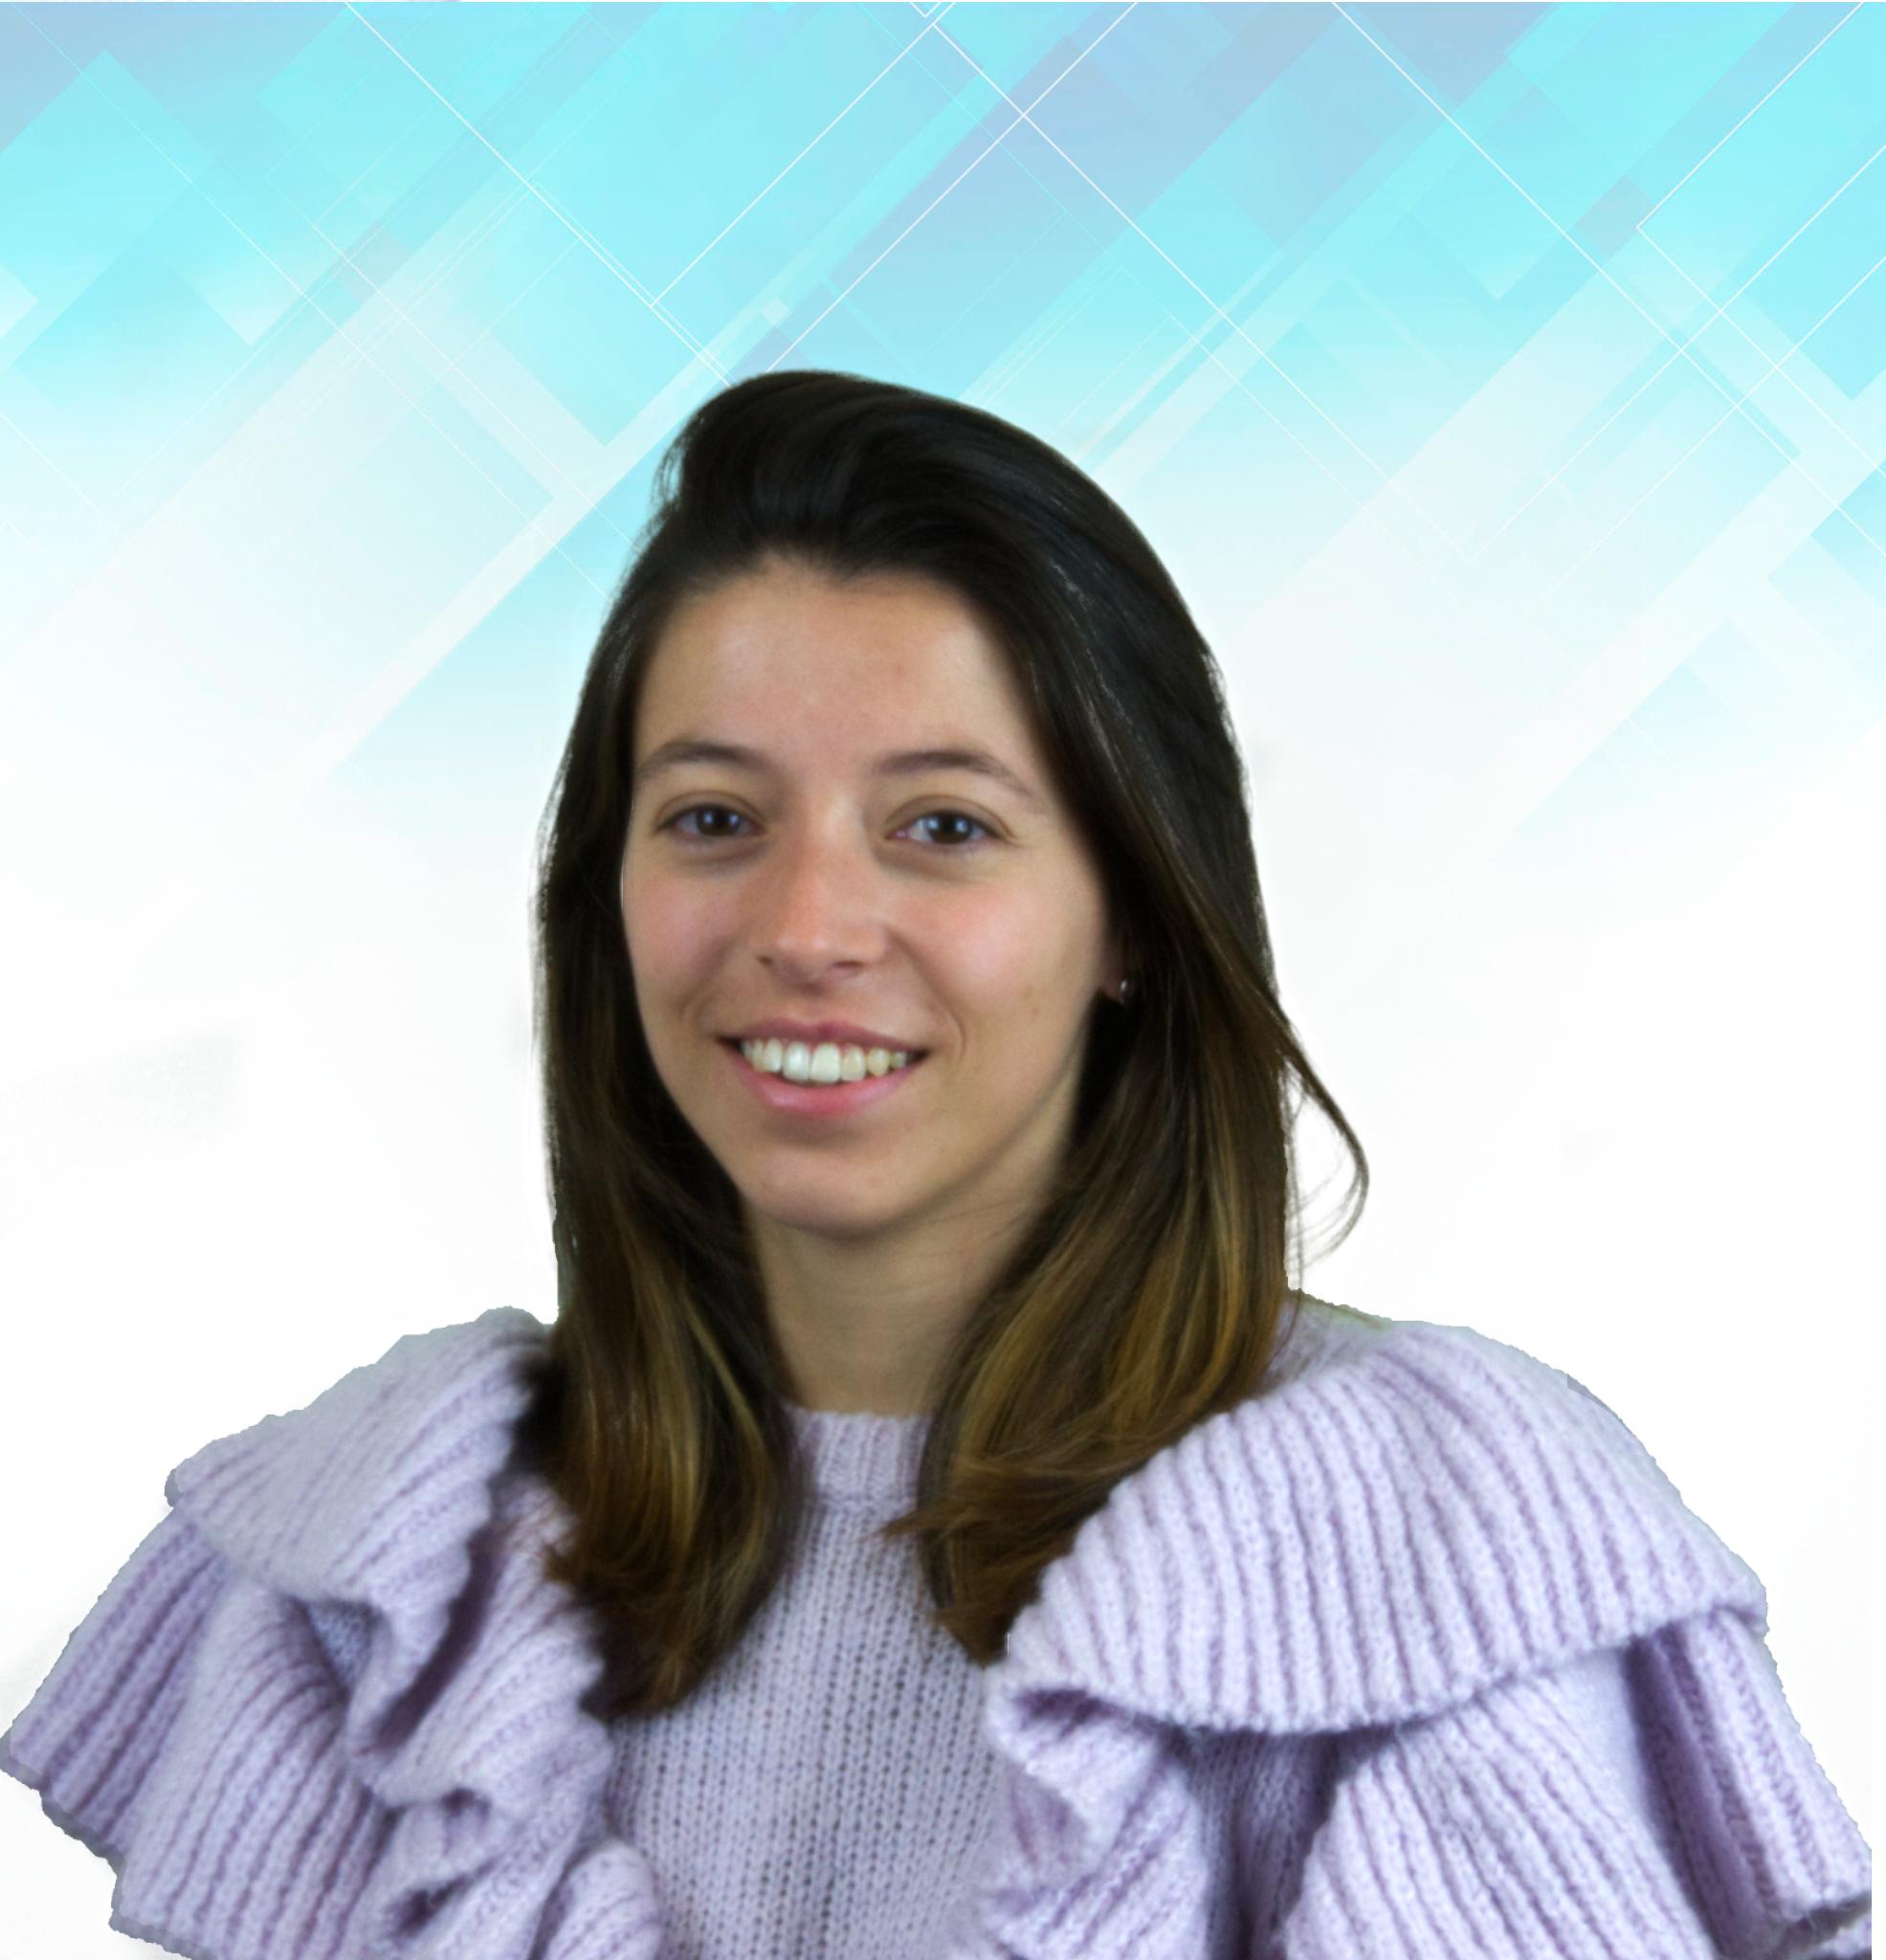 Sara Sanz Sáenz